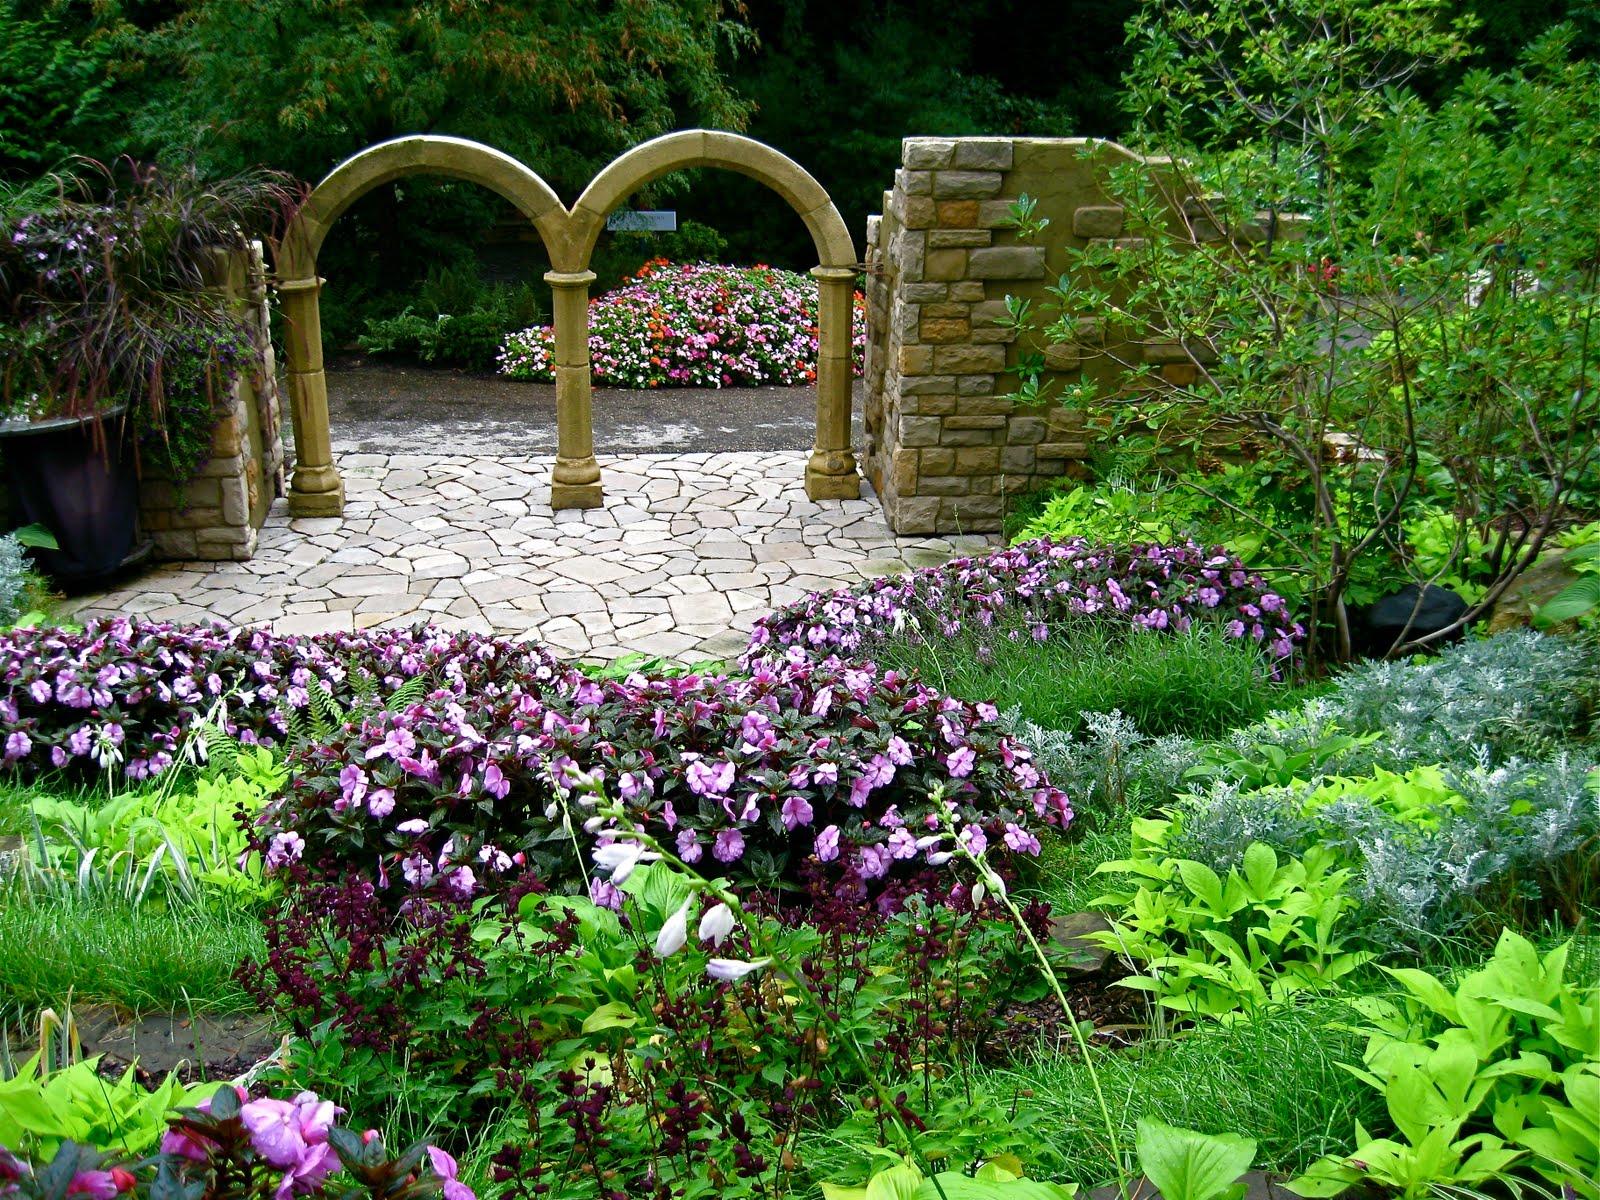 Cleveland botanical gardens hours u s central garden for Botanical gardens hours